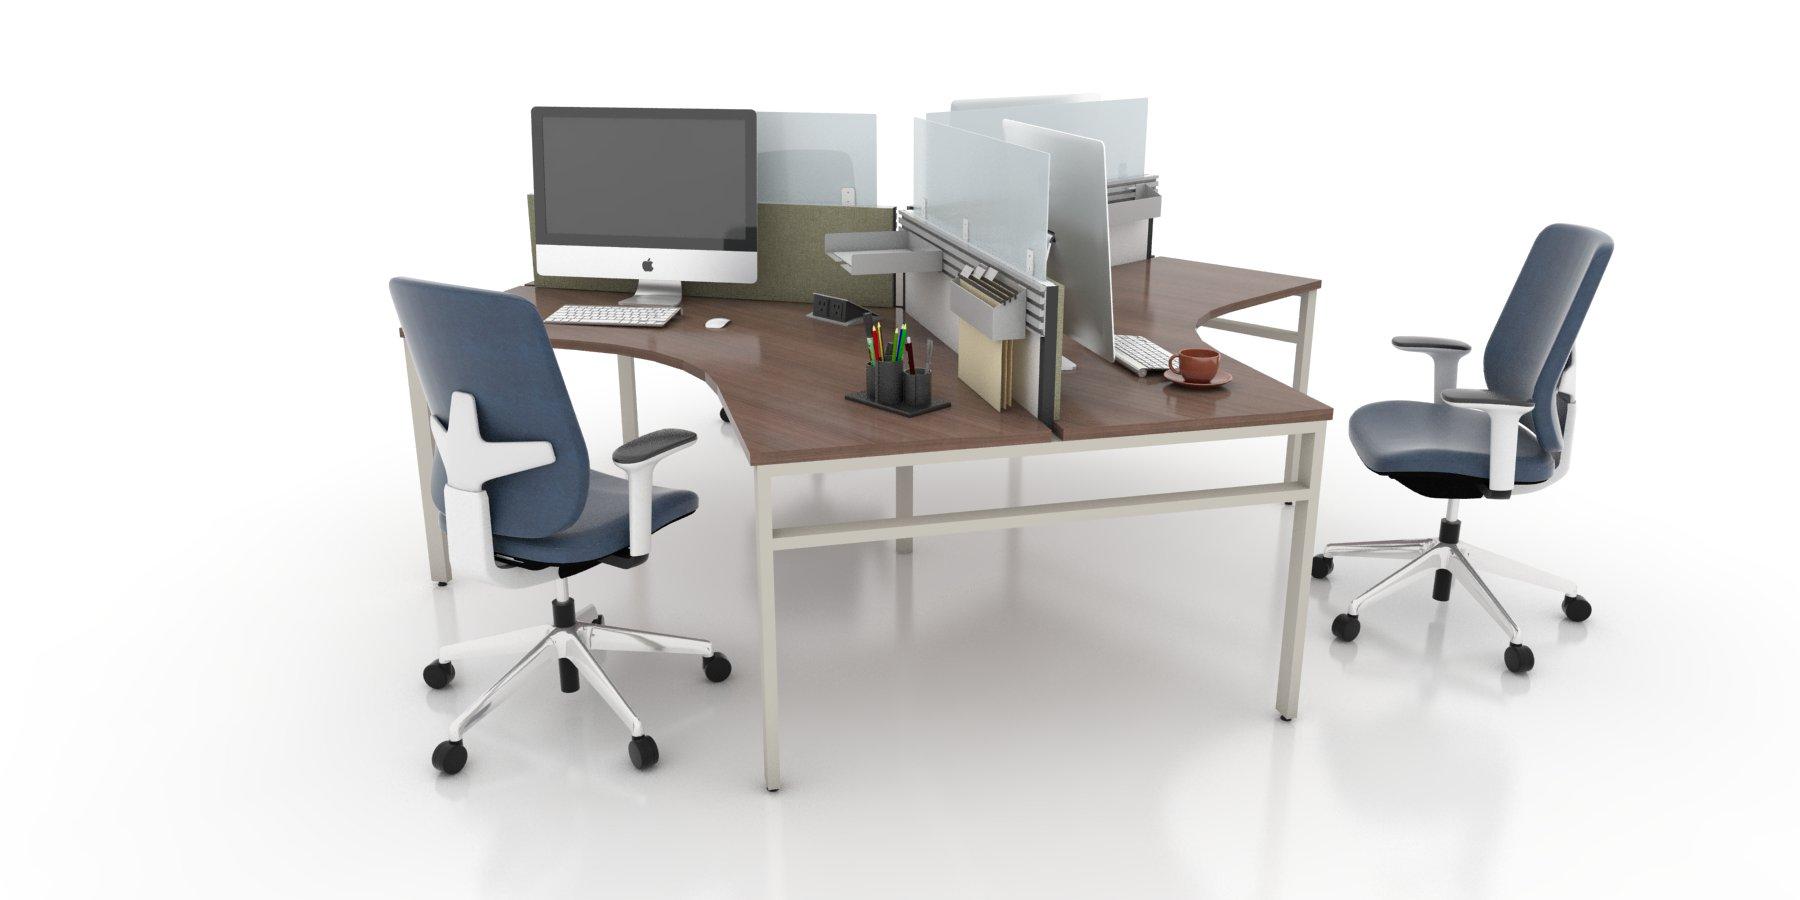 120 176 Bench Workstations Modern Office Furniture